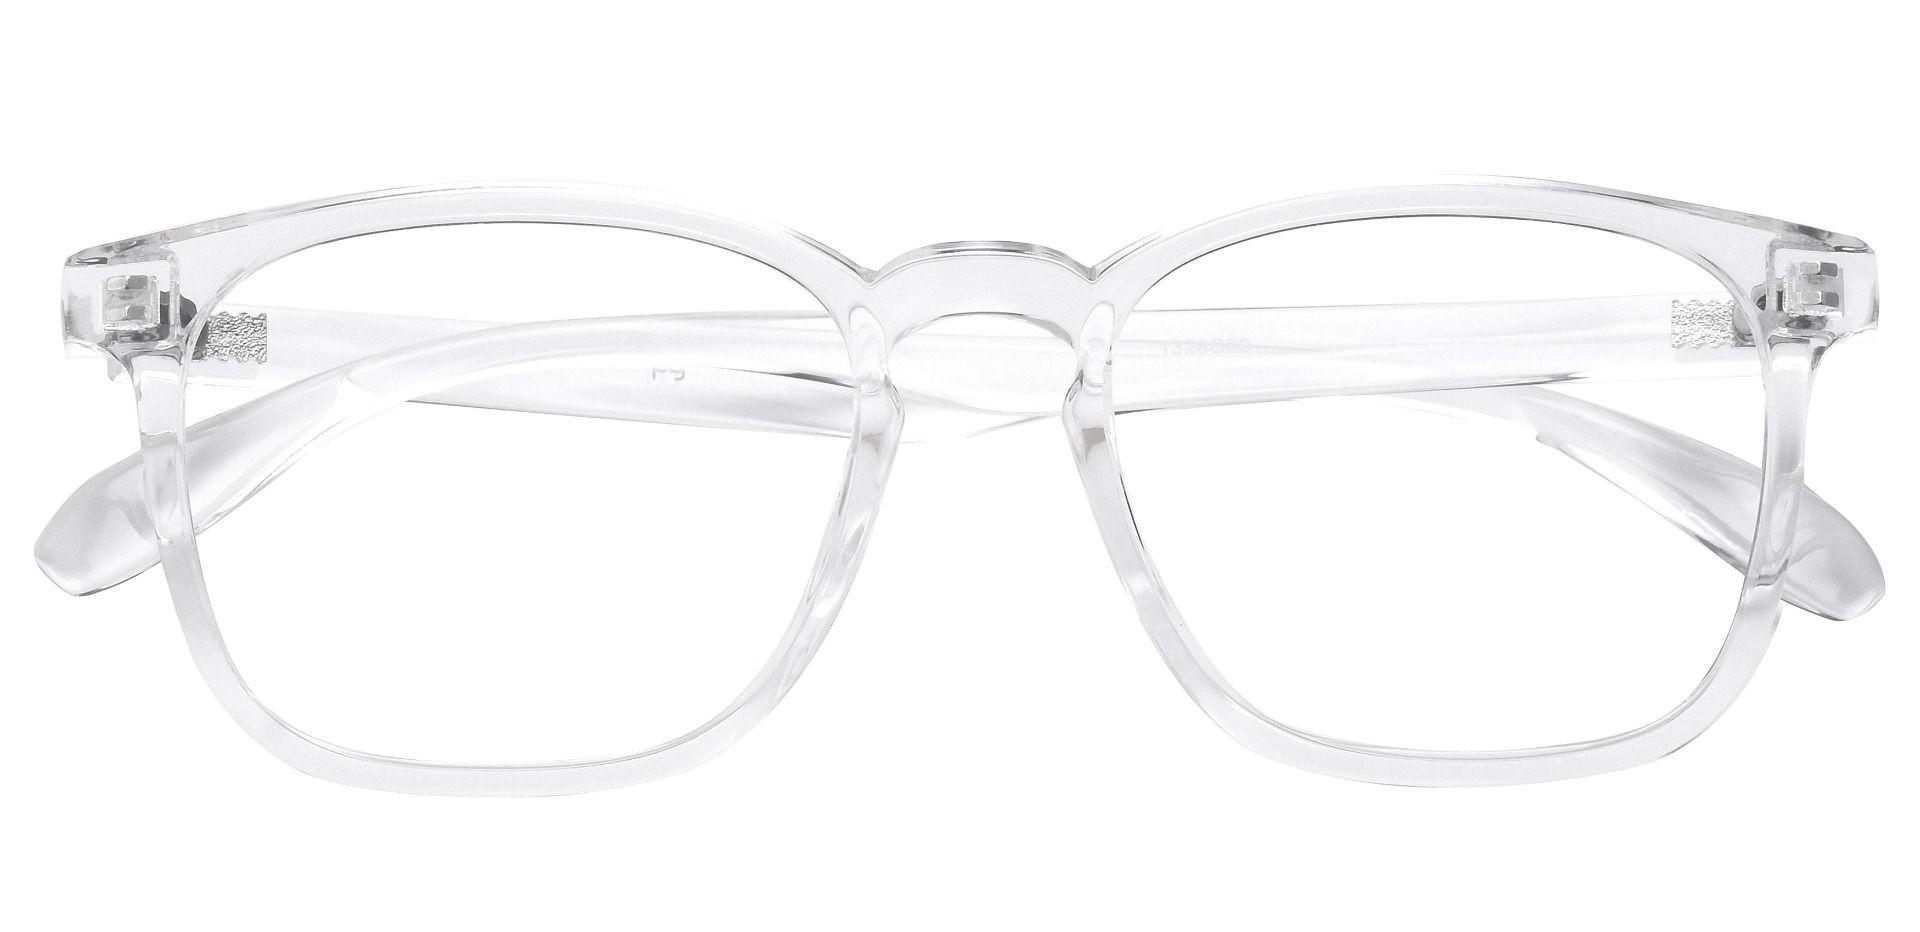 Dusk Classic Square Prescription Glasses - Clear